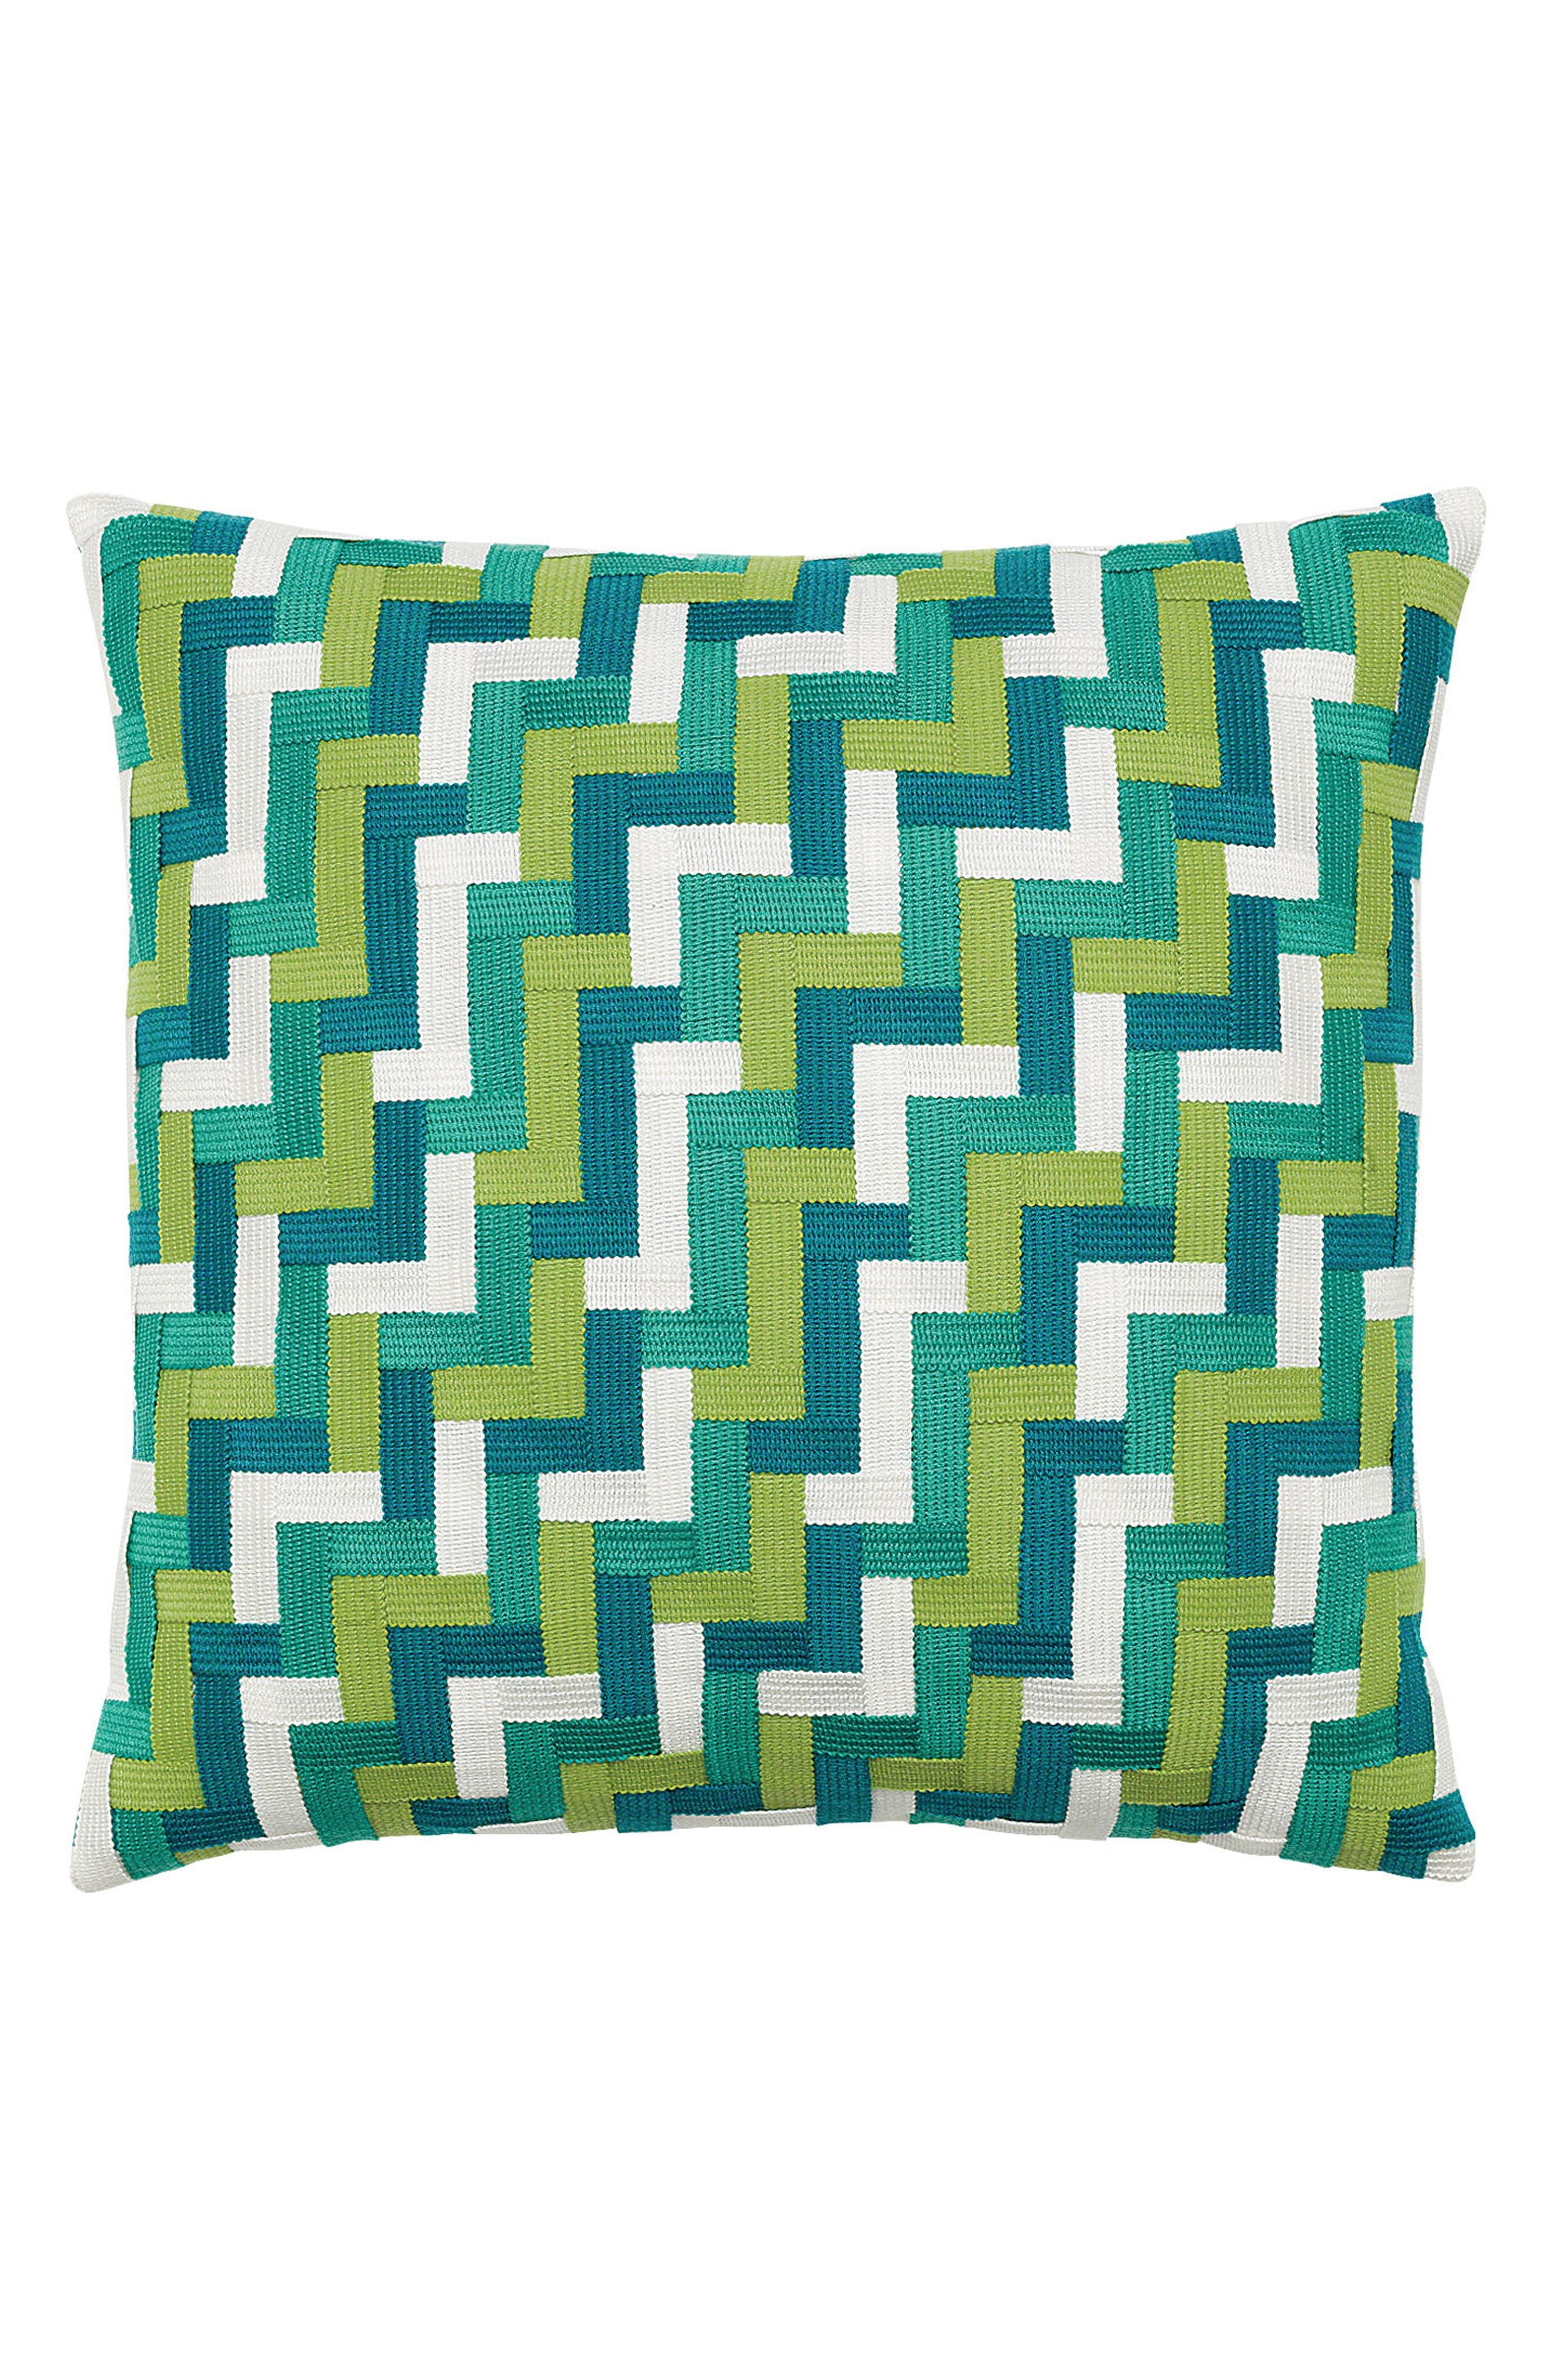 Eden Basket Weave Indoor/Outdoor Accent Pillow,                             Main thumbnail 1, color,                             Green/ Blue